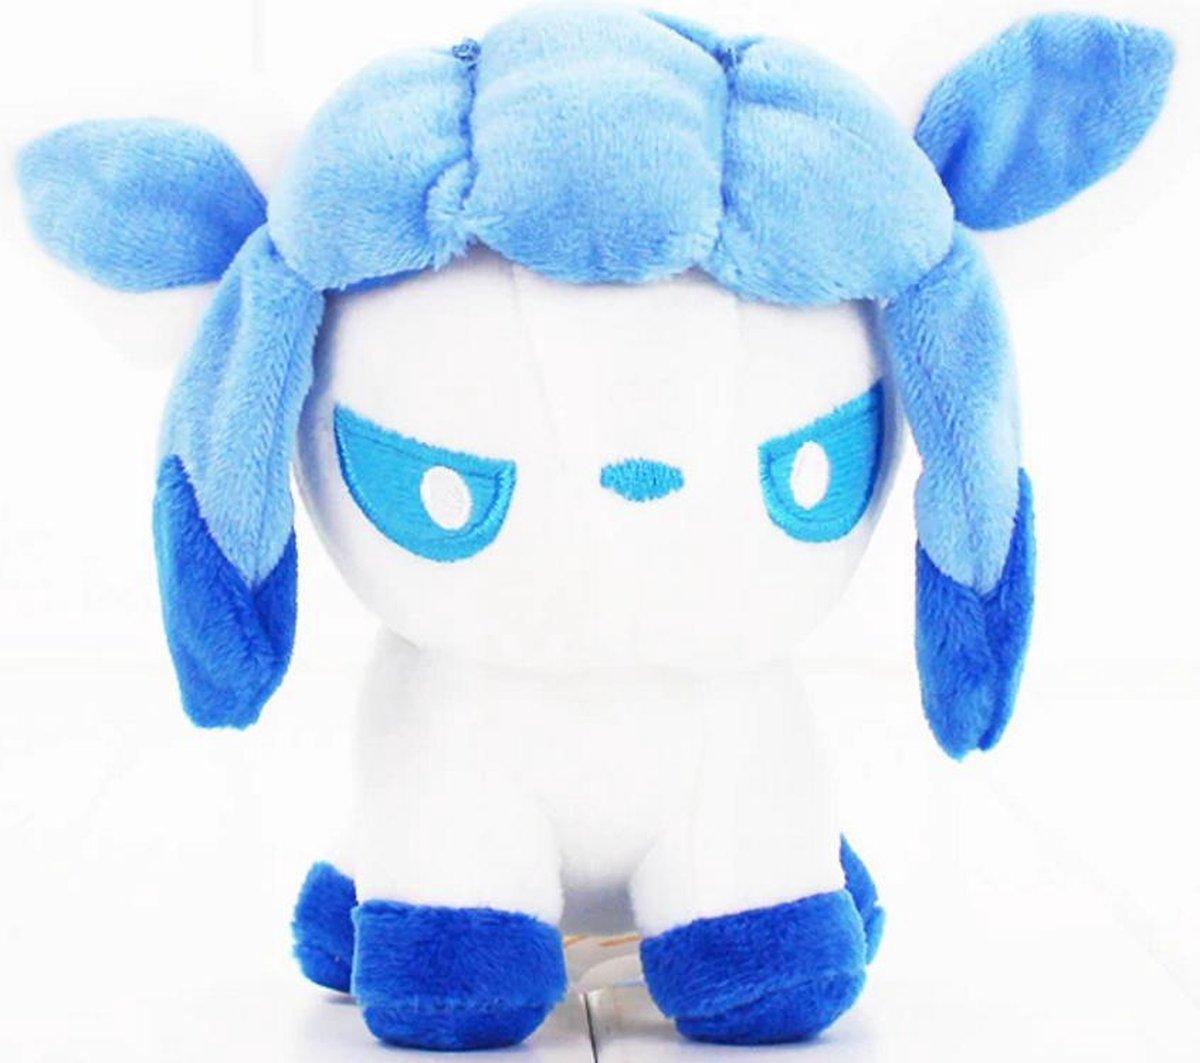 Knuffel Pokemon Glaceon - bekend van de TV - creator - Pokémon - pokéball - speelgoed - Plushe